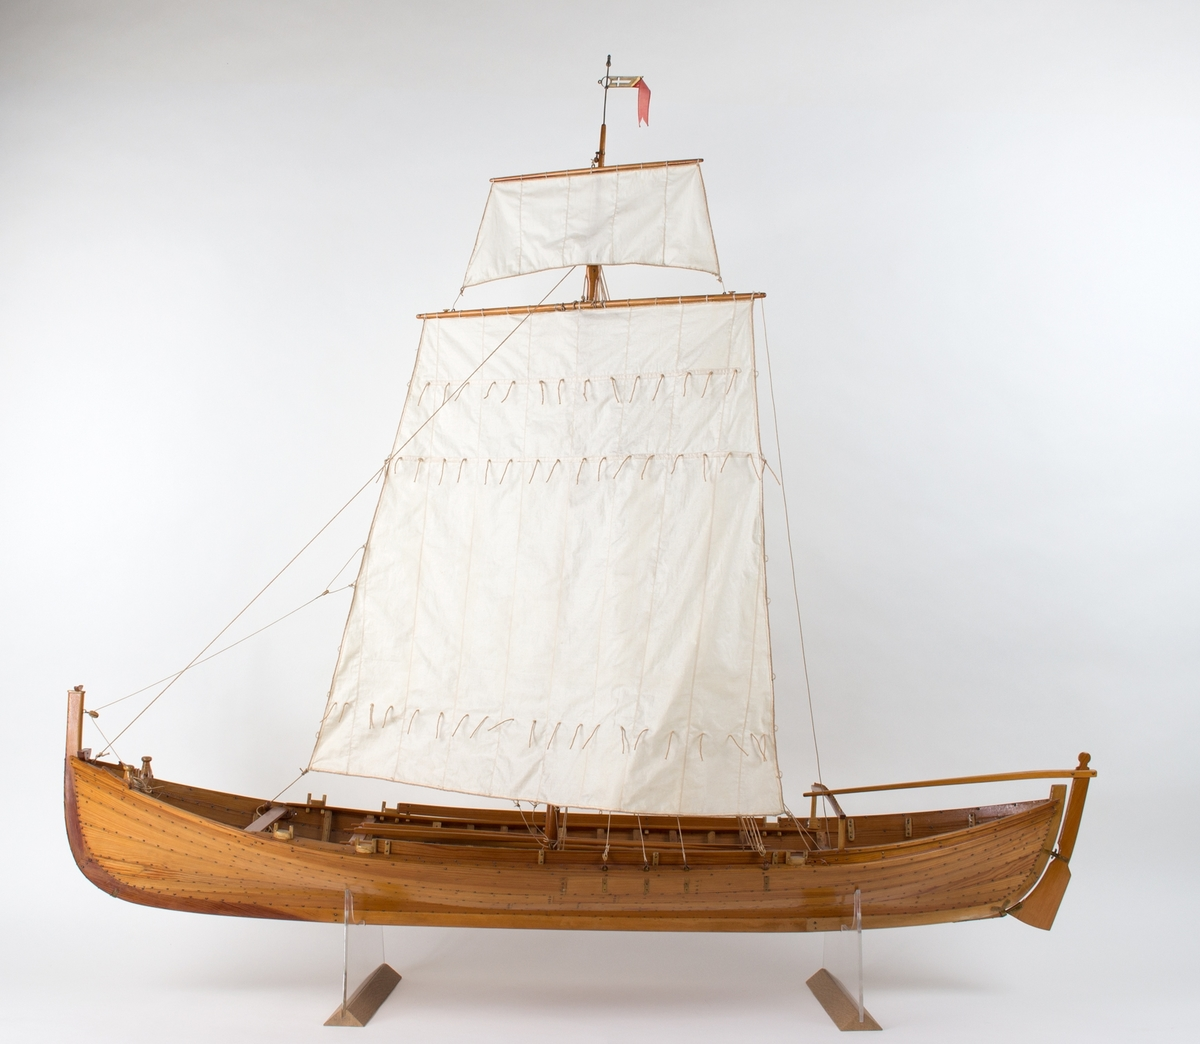 Modell av fembøring fra Birdal i Åfjord.